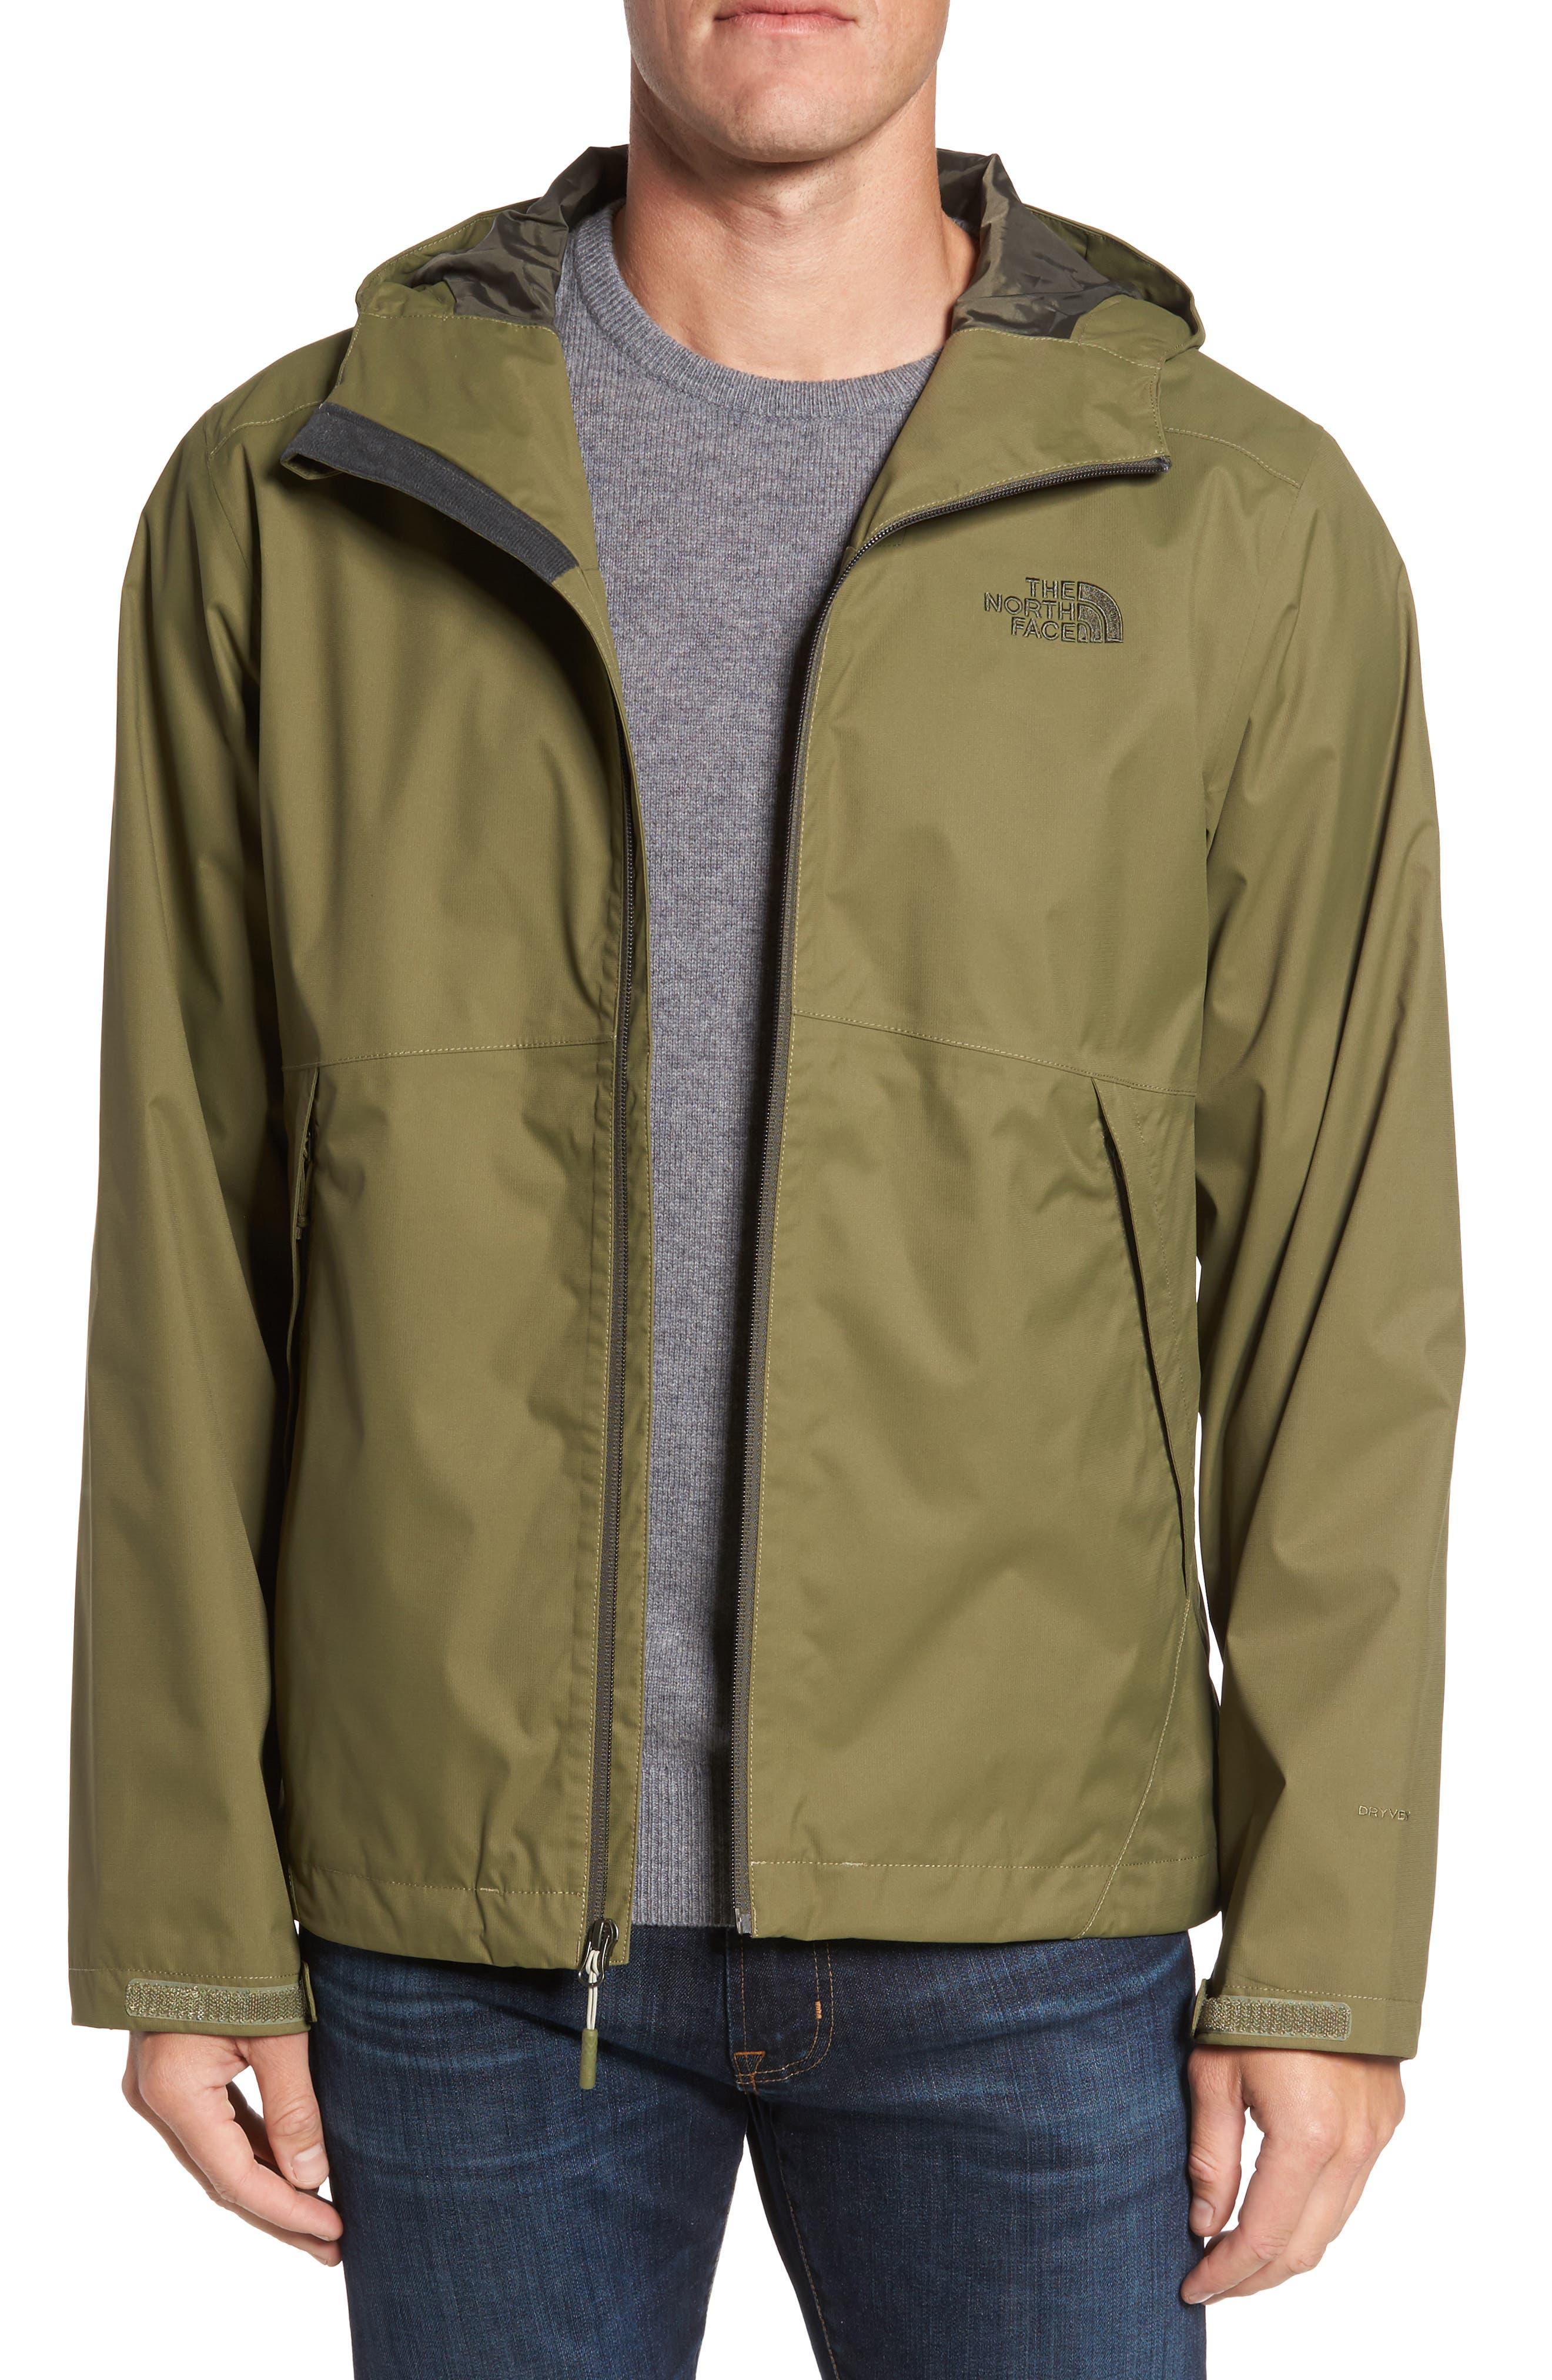 Alternate Image 1 Selected - The North Face 'Millerton' DryVent® Waterproof Hooded Jacket